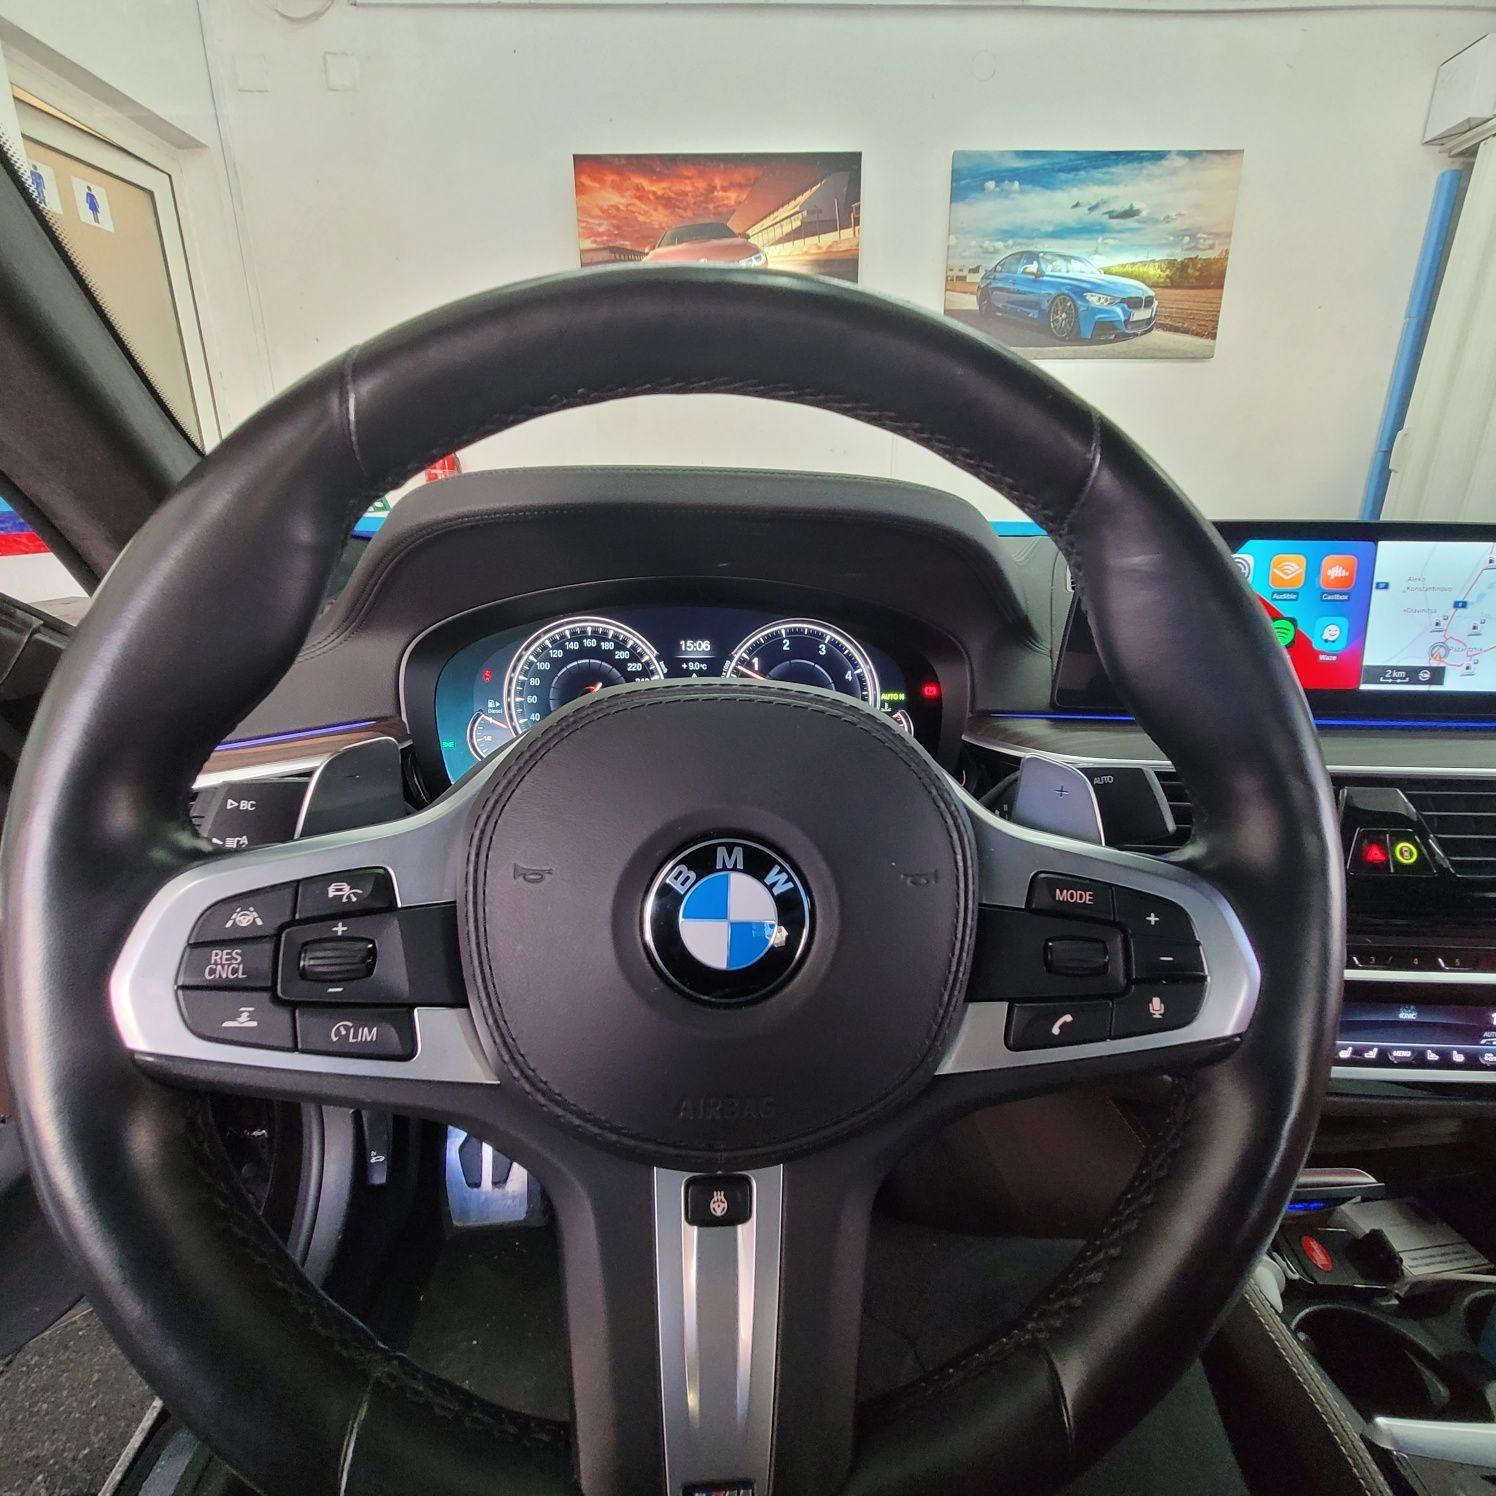 Отключване Apple CarPlay BMW G11 G12 G30 G31 F10 F15 F30 F16 X3 X5 X6